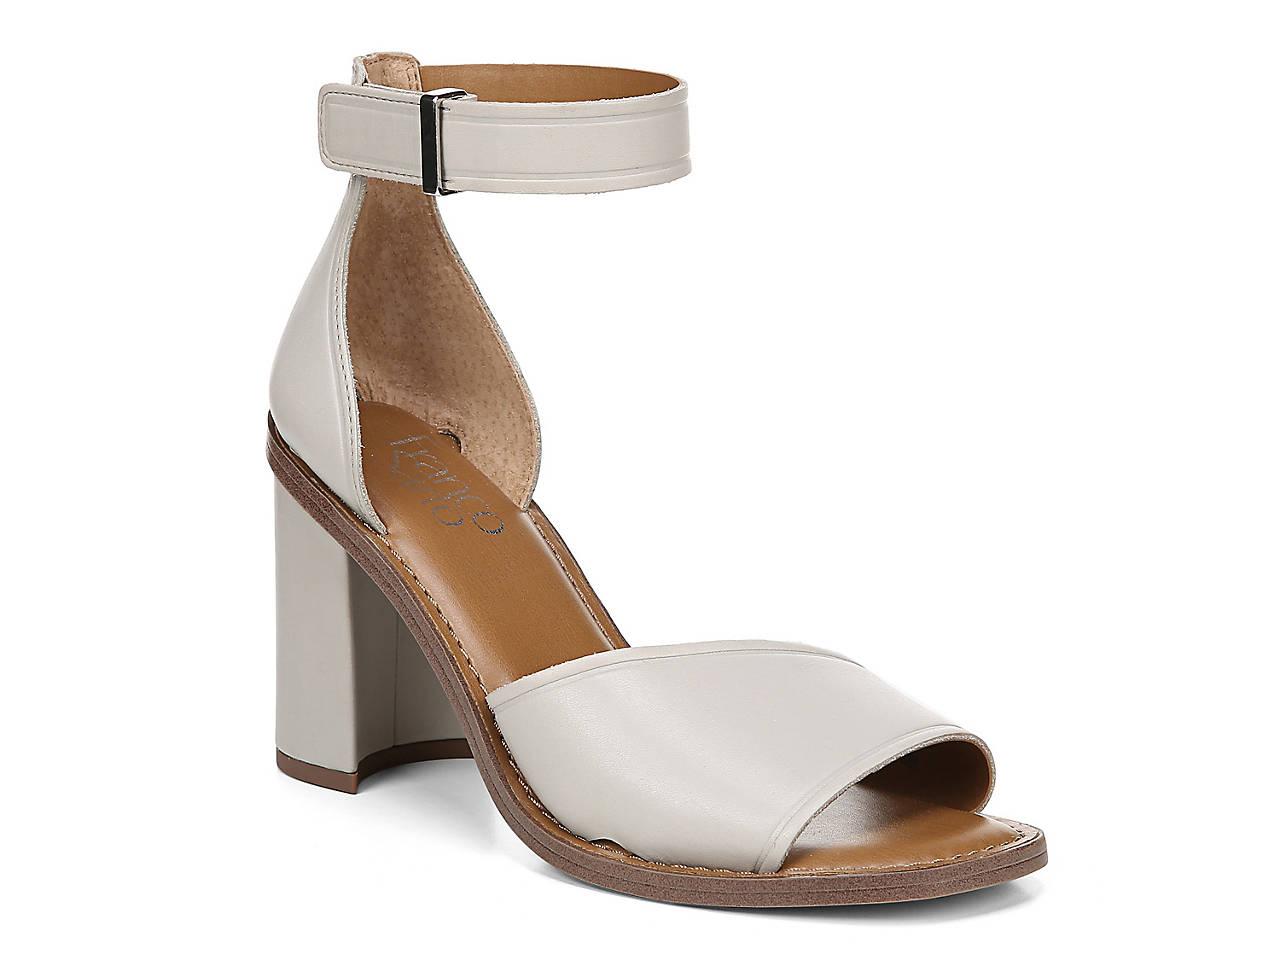 60e1269ed11a Franco Sarto Caia Sandal Women s Shoes